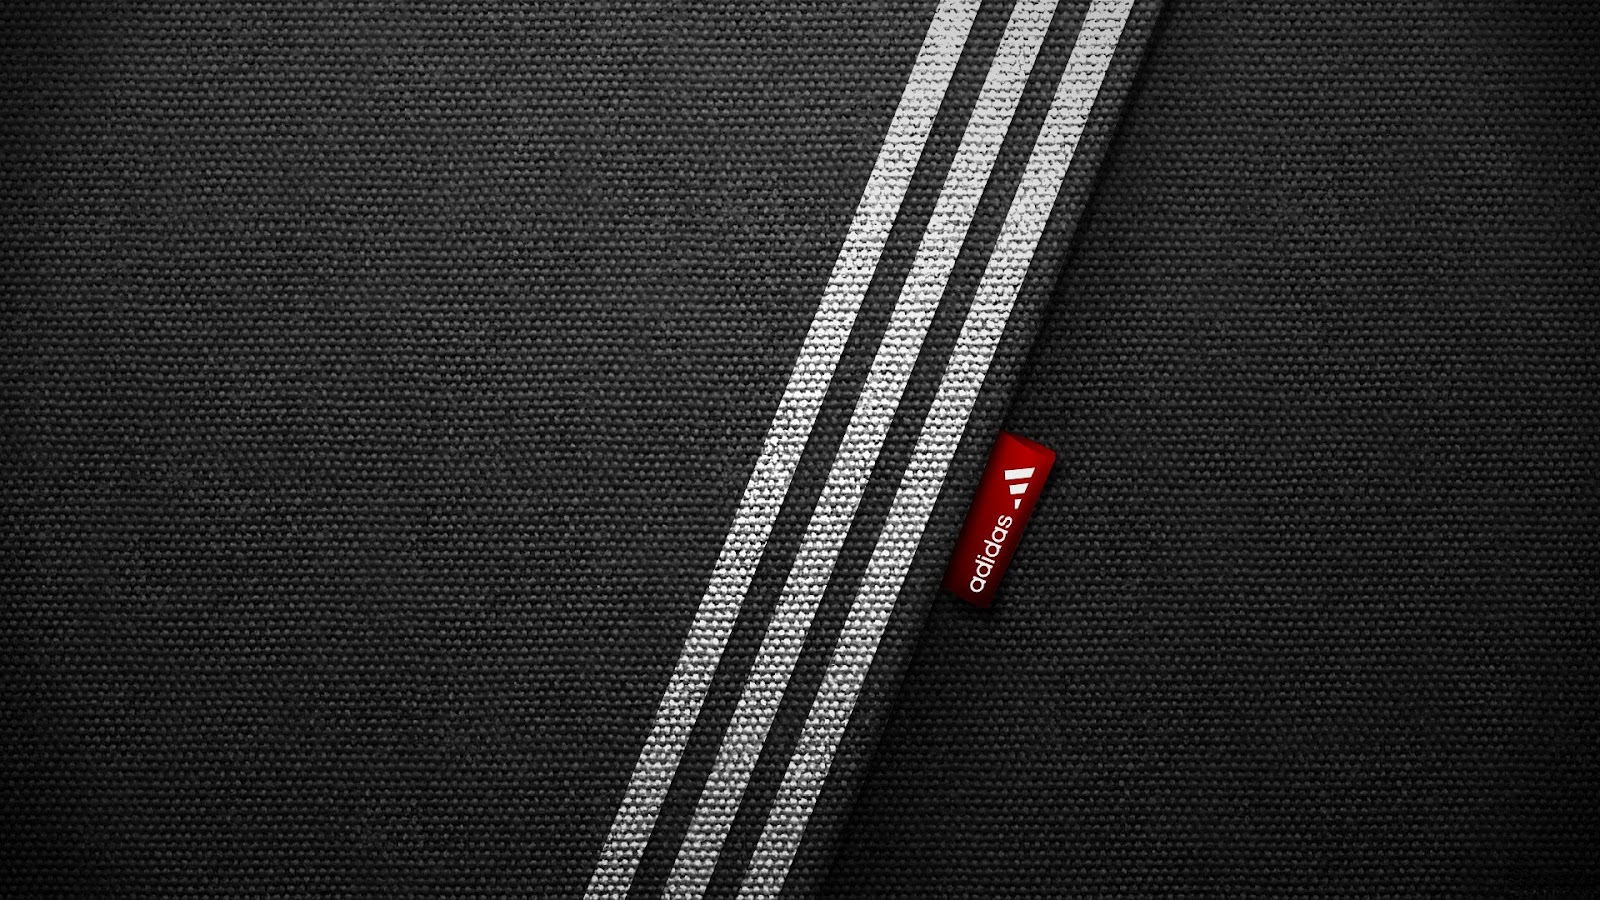 http://4.bp.blogspot.com/-TmM9NcNe5Fc/T50r0F9Mt8I/AAAAAAAABdo/l9khdPivvy4/s1600/Adidas_Label_Logo_HD_Wallpaper-Vvallpaper.Net.jpg